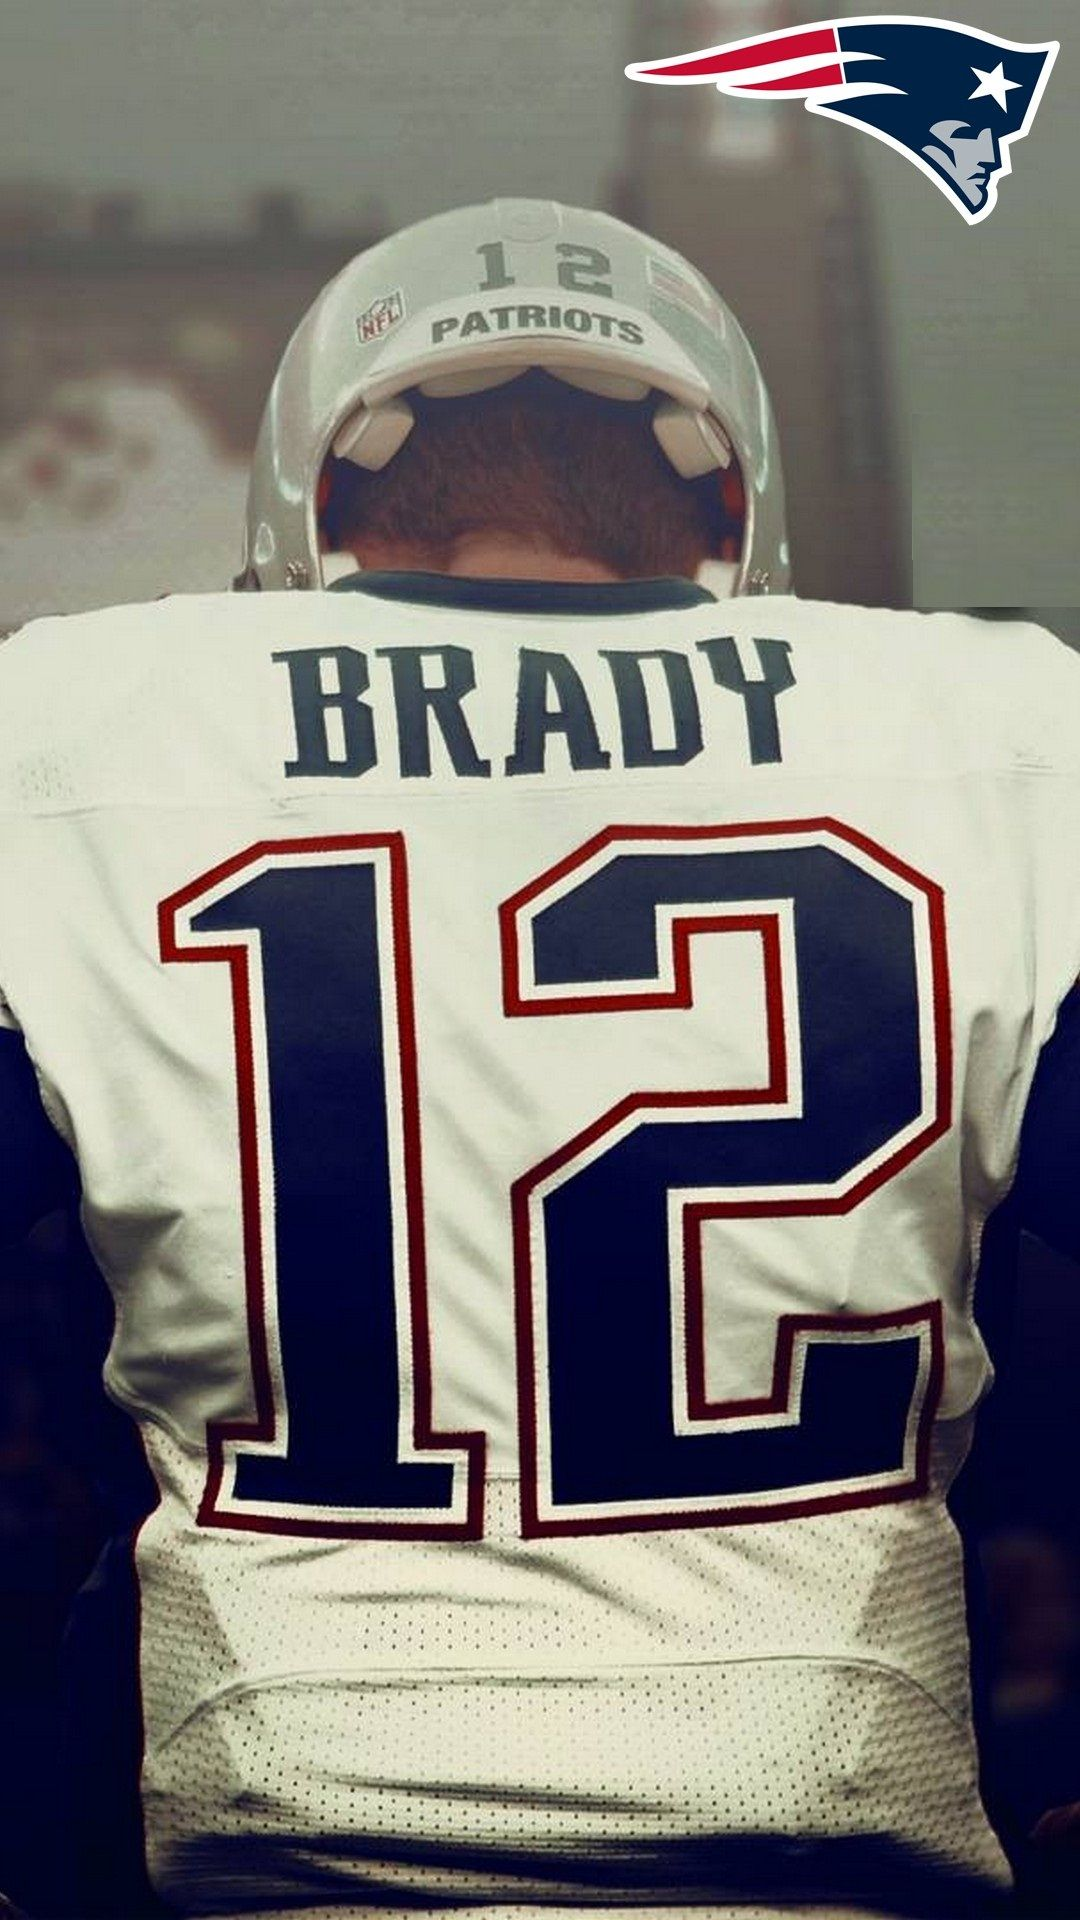 Tom Brady Patriots Iphone 7 Plus Wallpaper 2021 Nfl Football Wallpapers Tom Brady Patriots Iphone 7 Plus Wallpaper New England Patriots Wallpaper